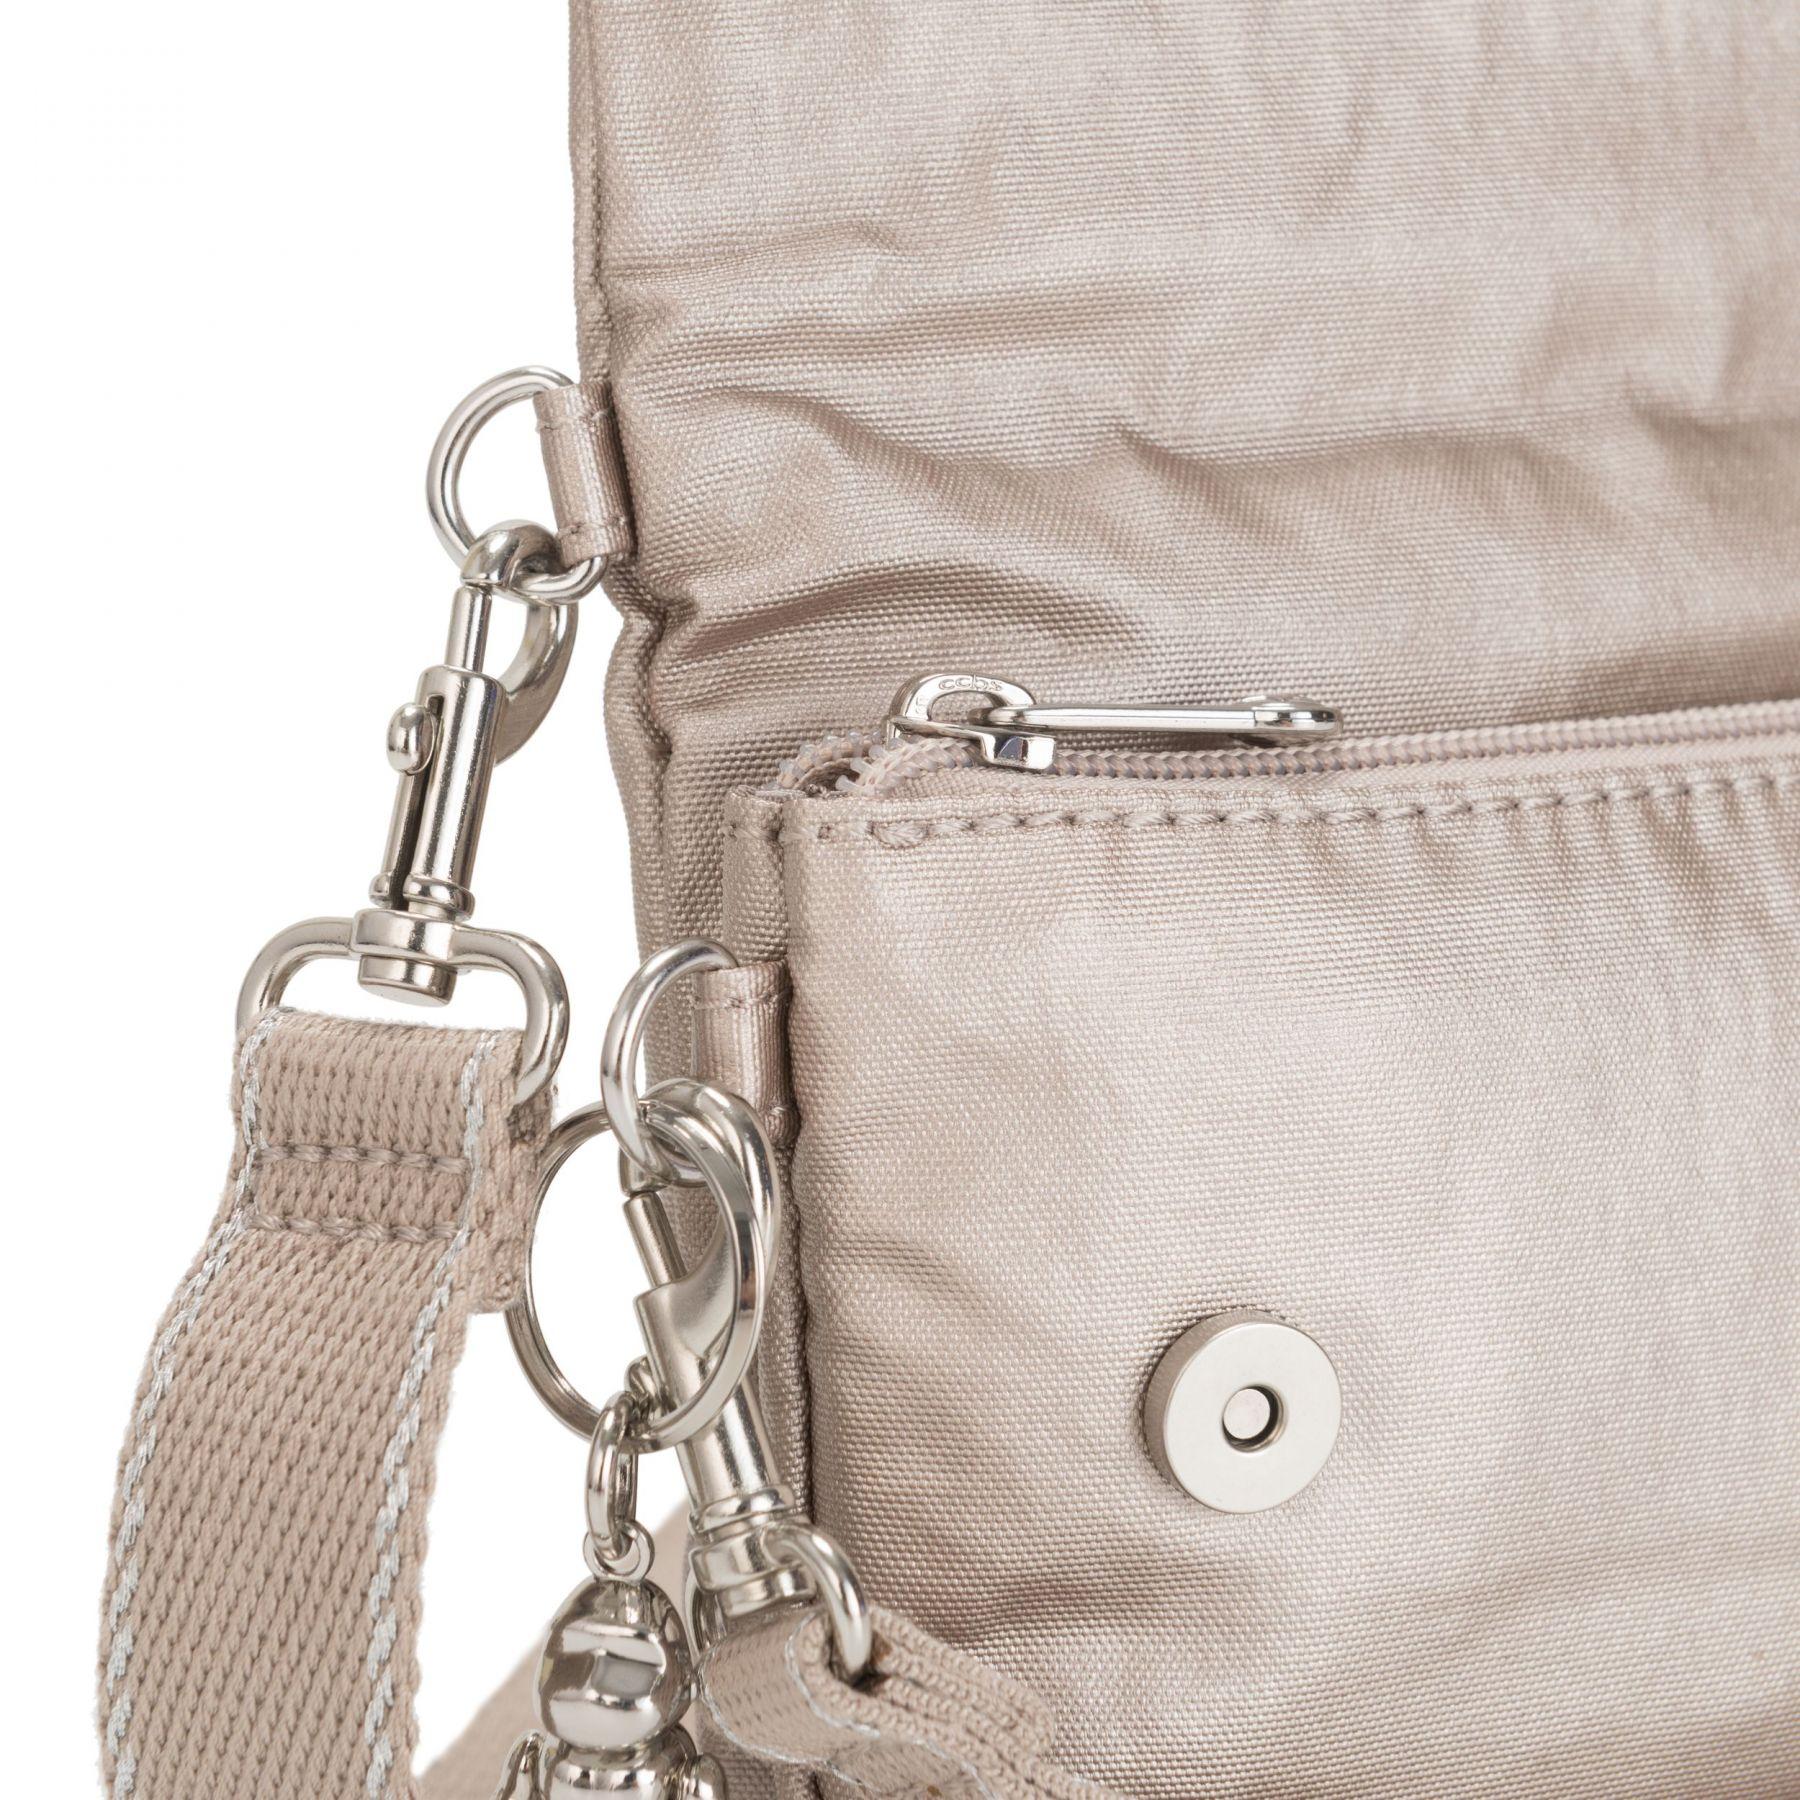 LYNNE Latest Shoulder Bags by Kipling